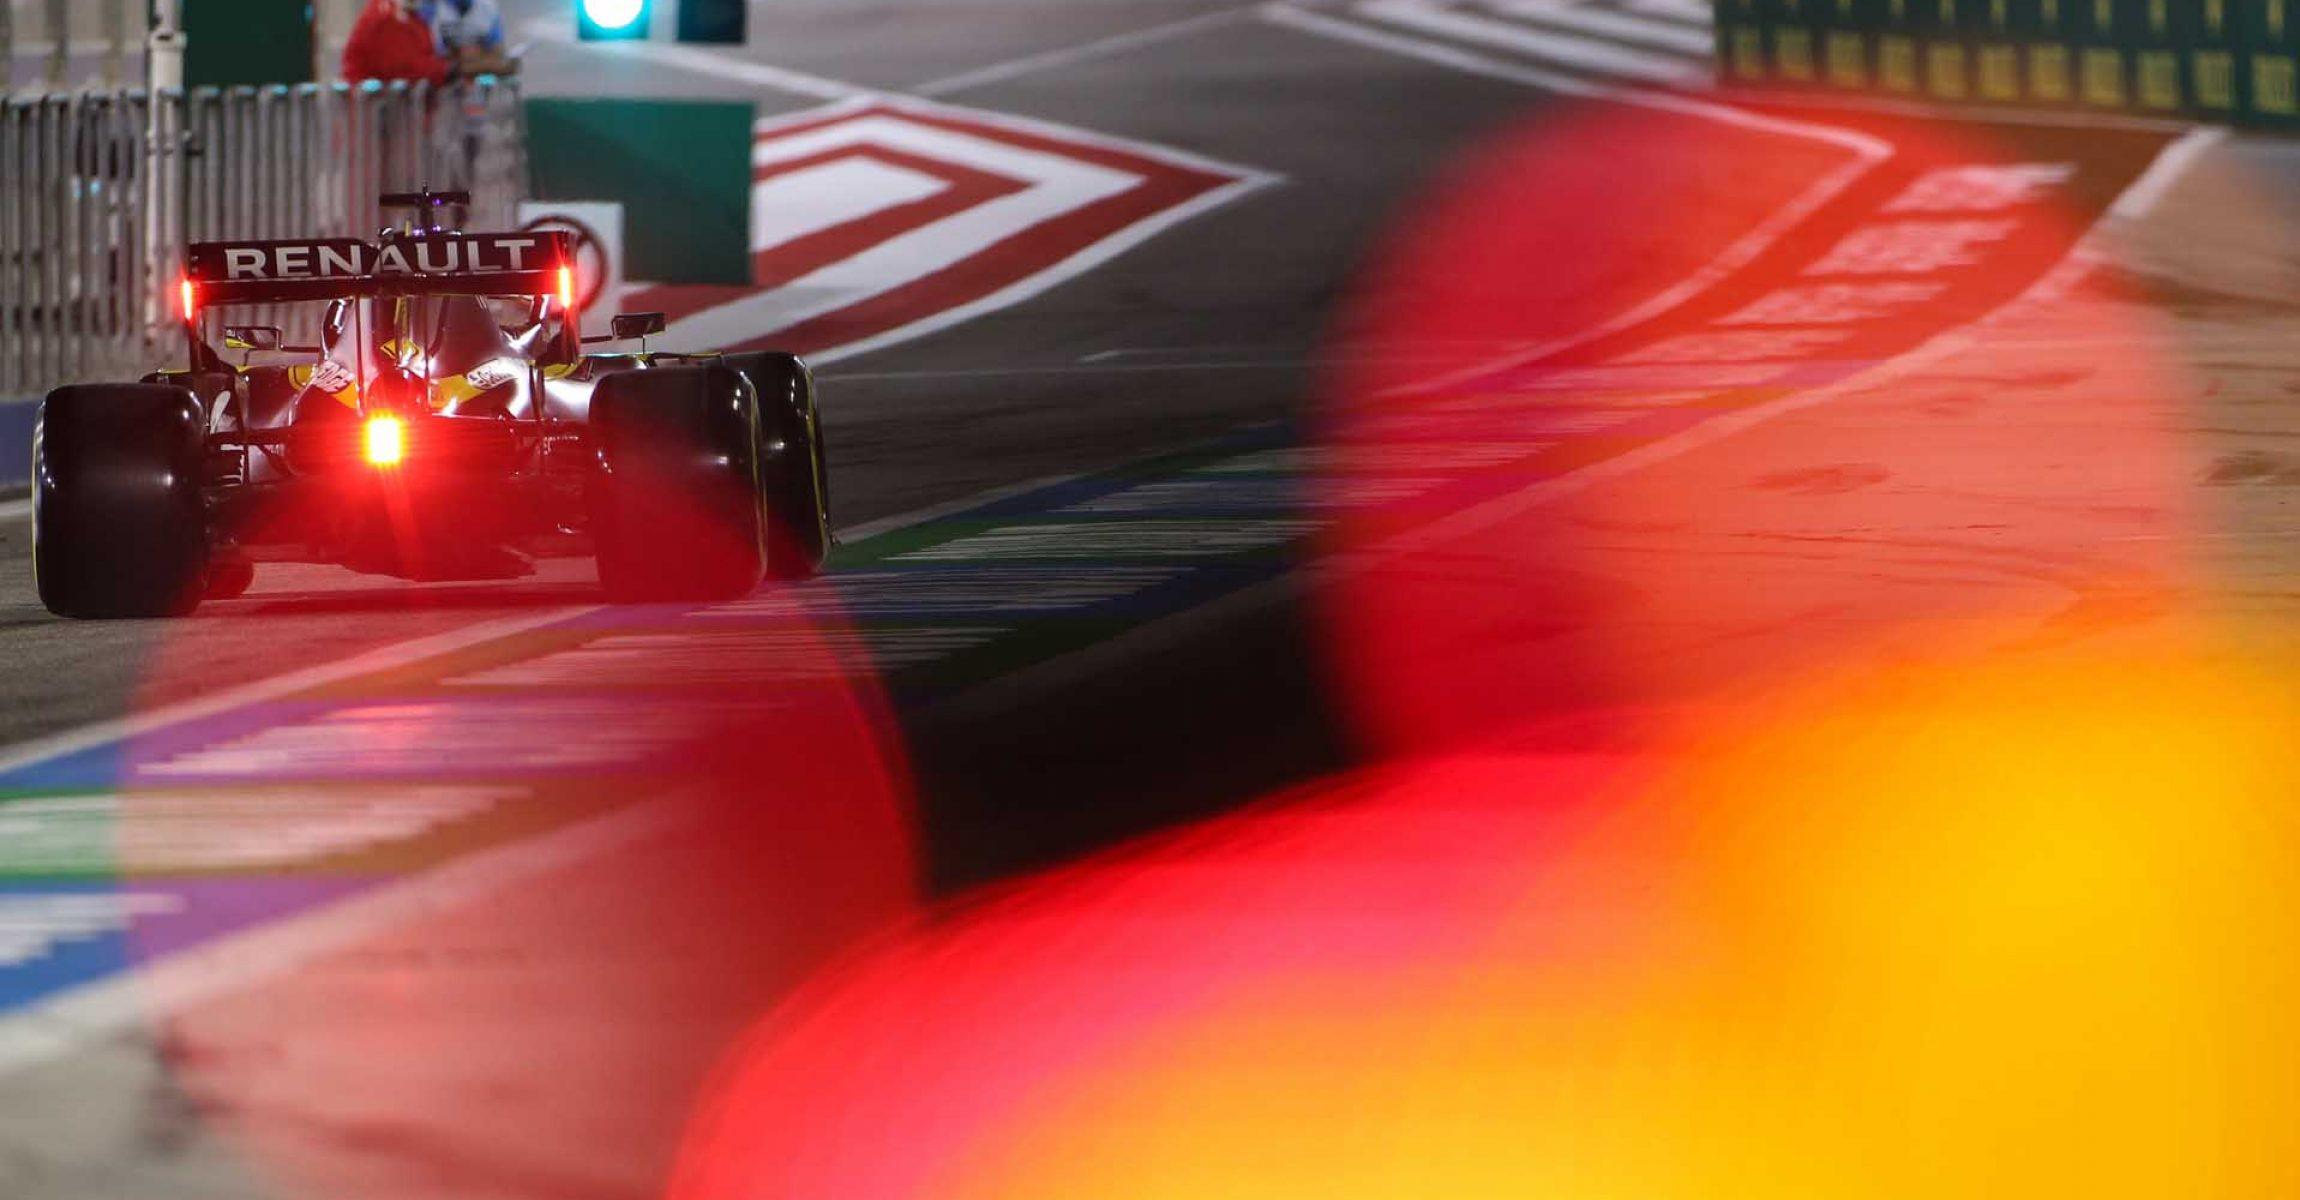 Daniel Ricciardo (AUS) Renault F1 Team RS20. Sakhir Grand Prix, Saturday 5th December 2020. Sakhir, Bahrain.